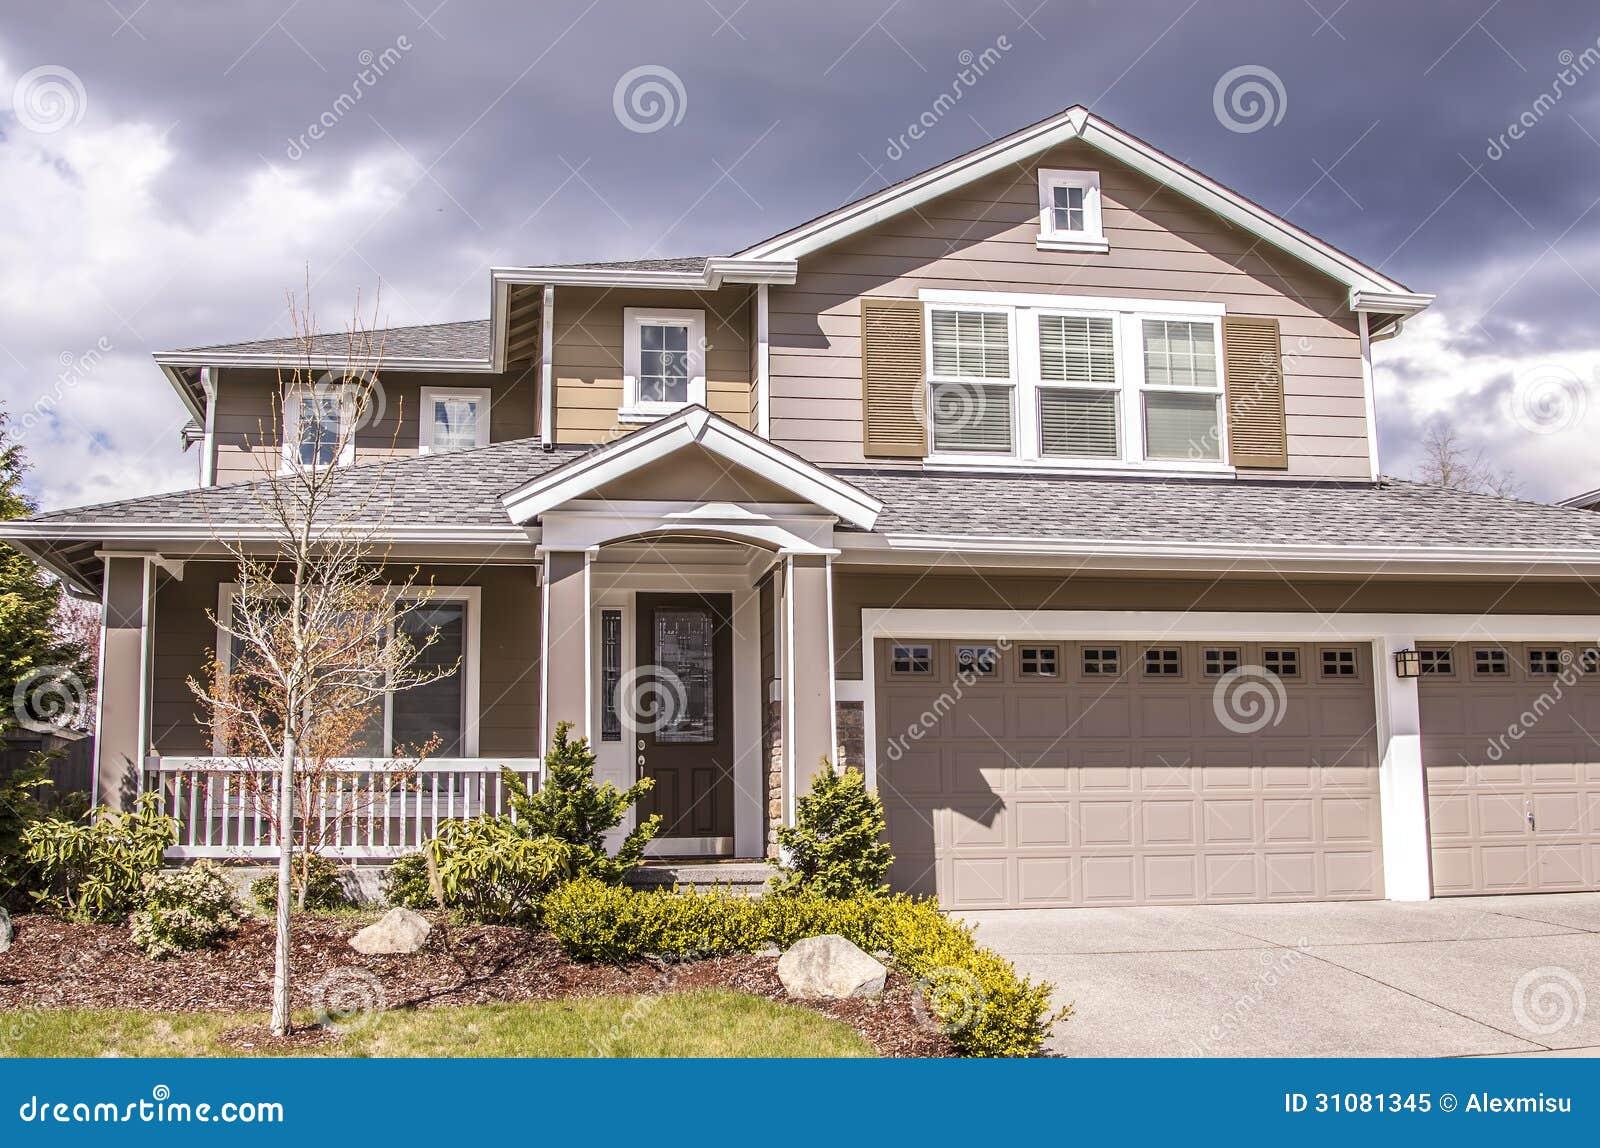 Suburban house royalty free stock photo image 31081345 for Suburban house plans